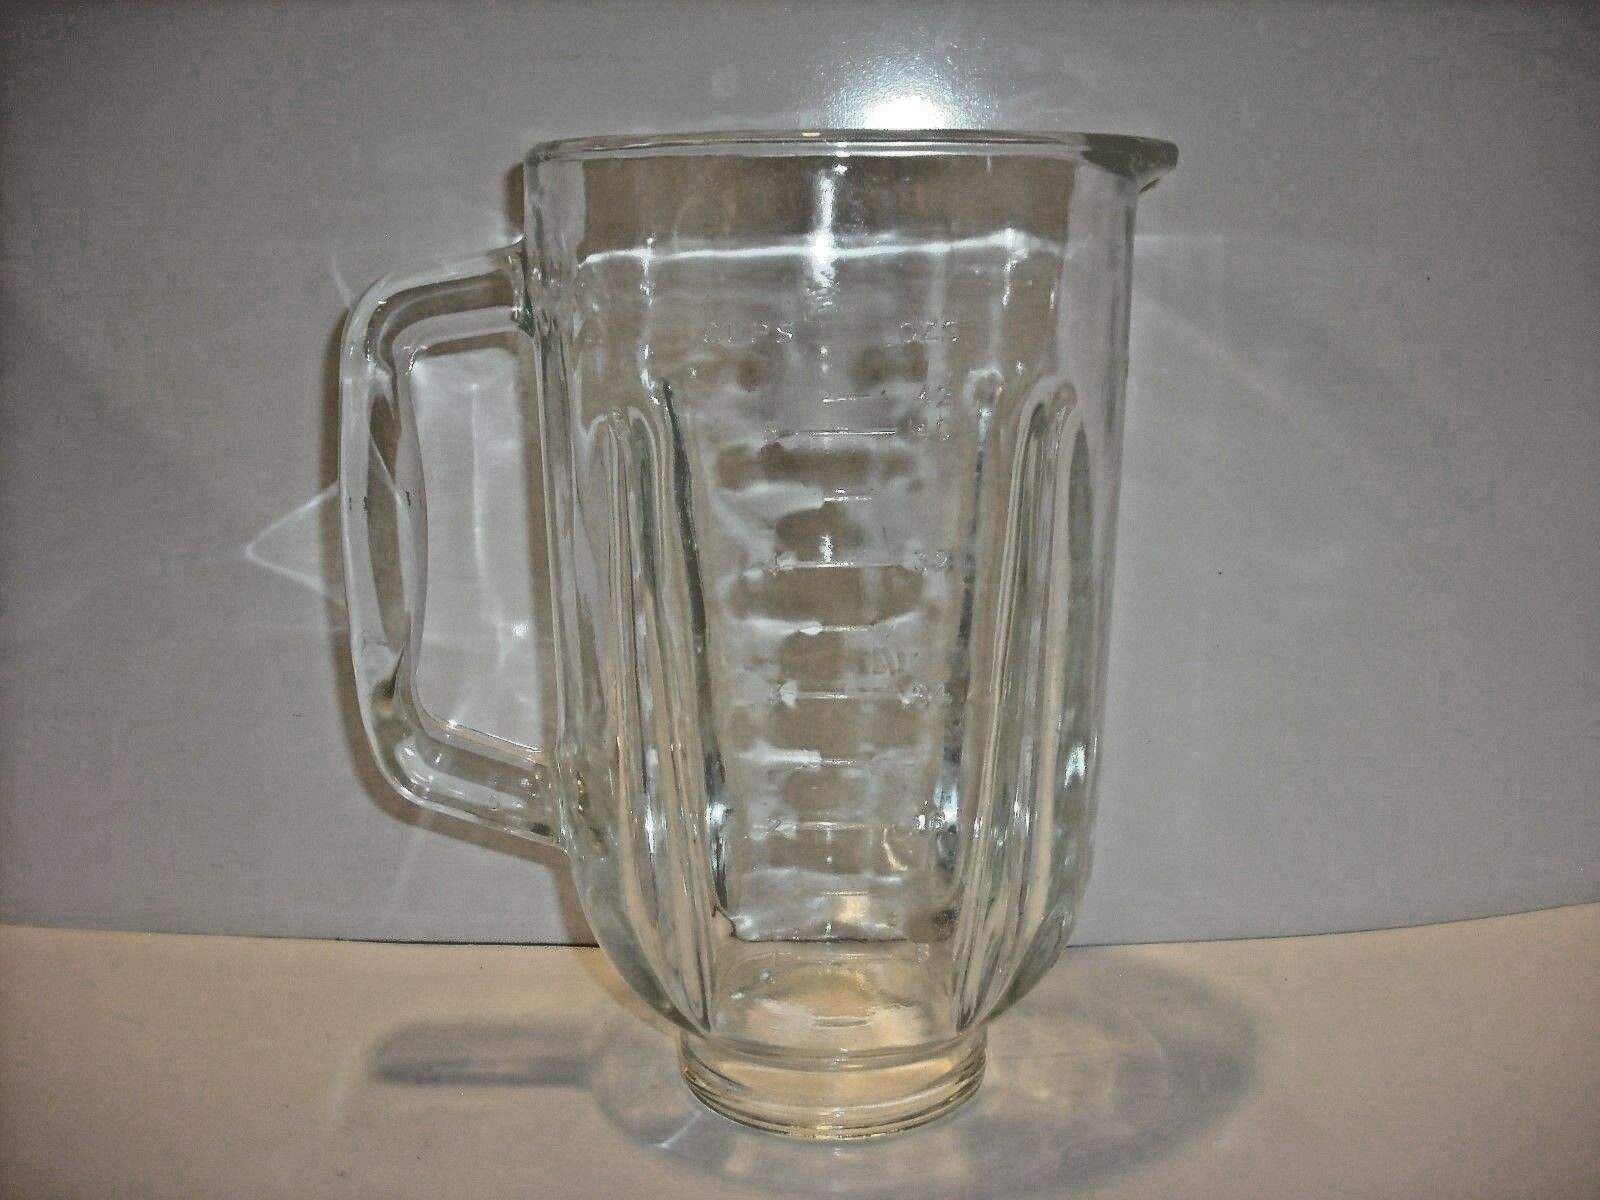 Hamilton Beach® Blender Compatible 1.25 Liter Glass Jar Replacement FITS MOST